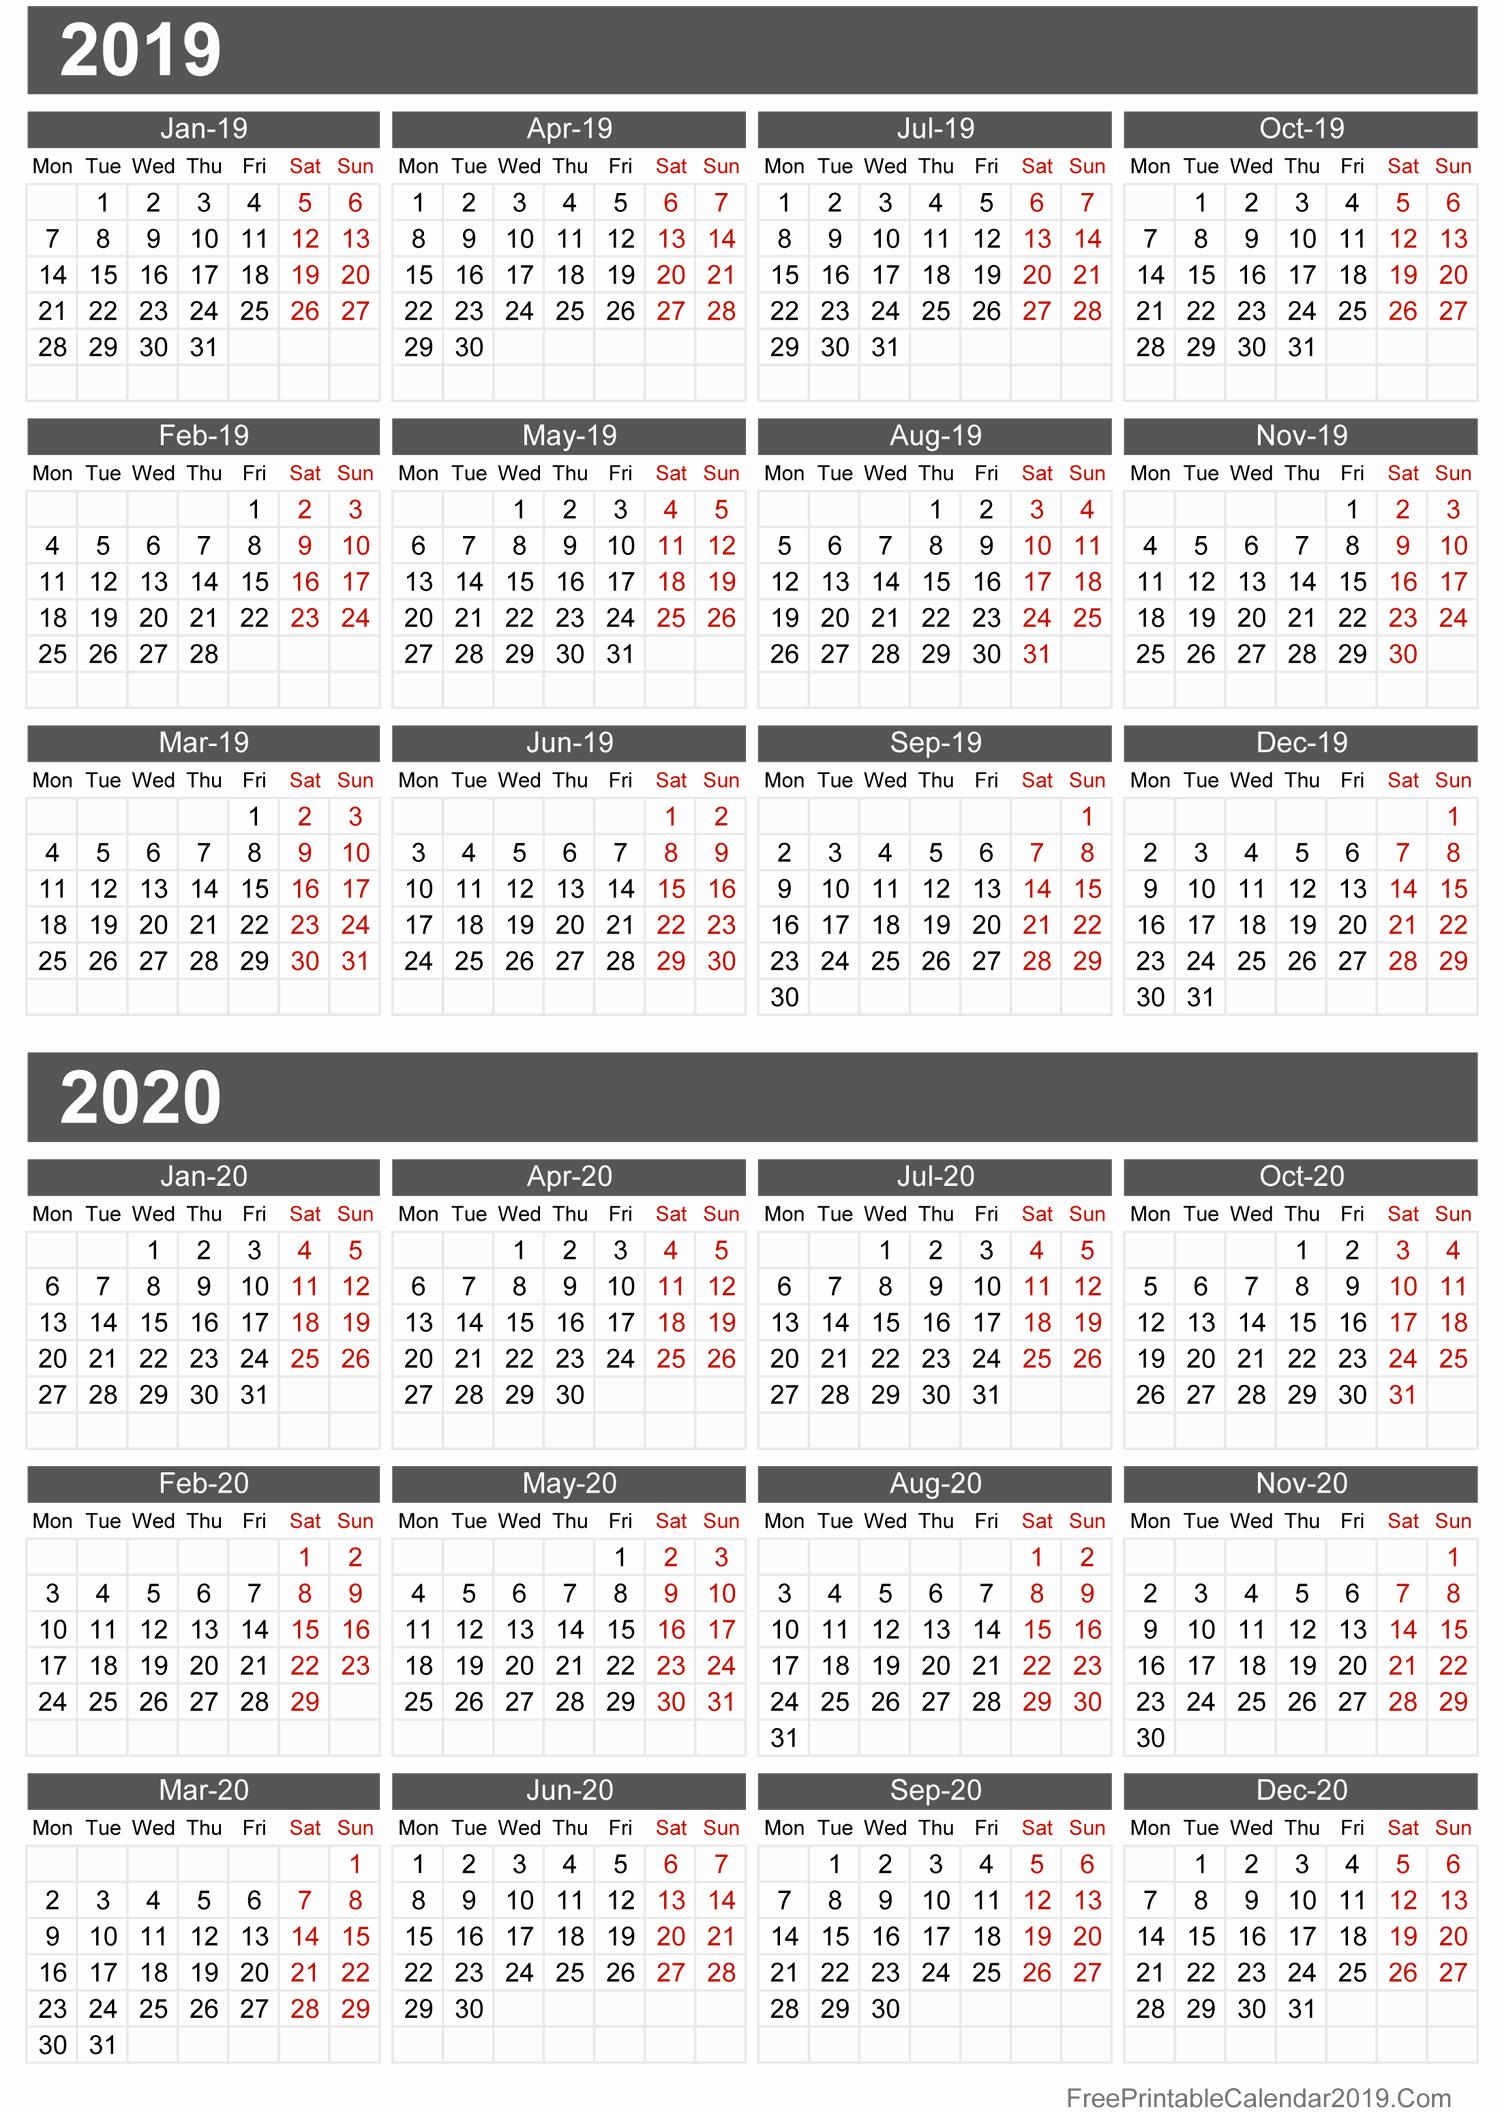 2019 Word Calendar with Holidays Luxury Free Printable Calendar 2019 with Holidays In Word Excel Pdf